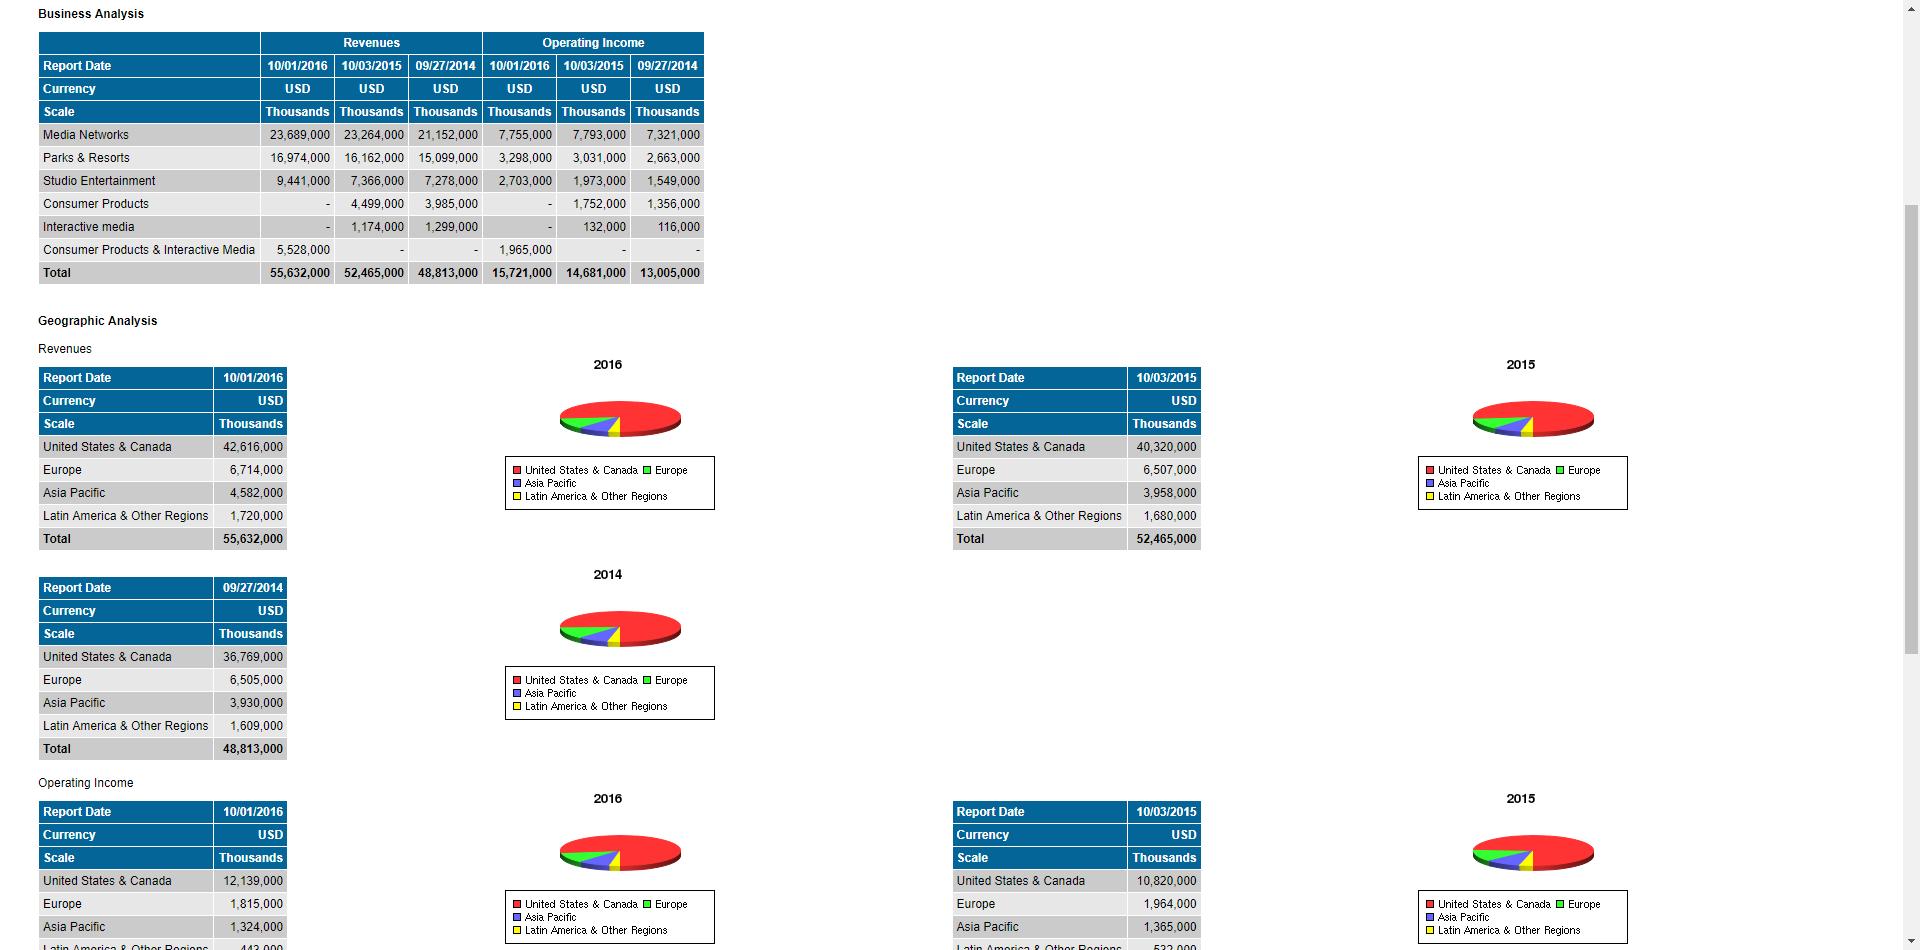 screenshot of business revenues through mergent database